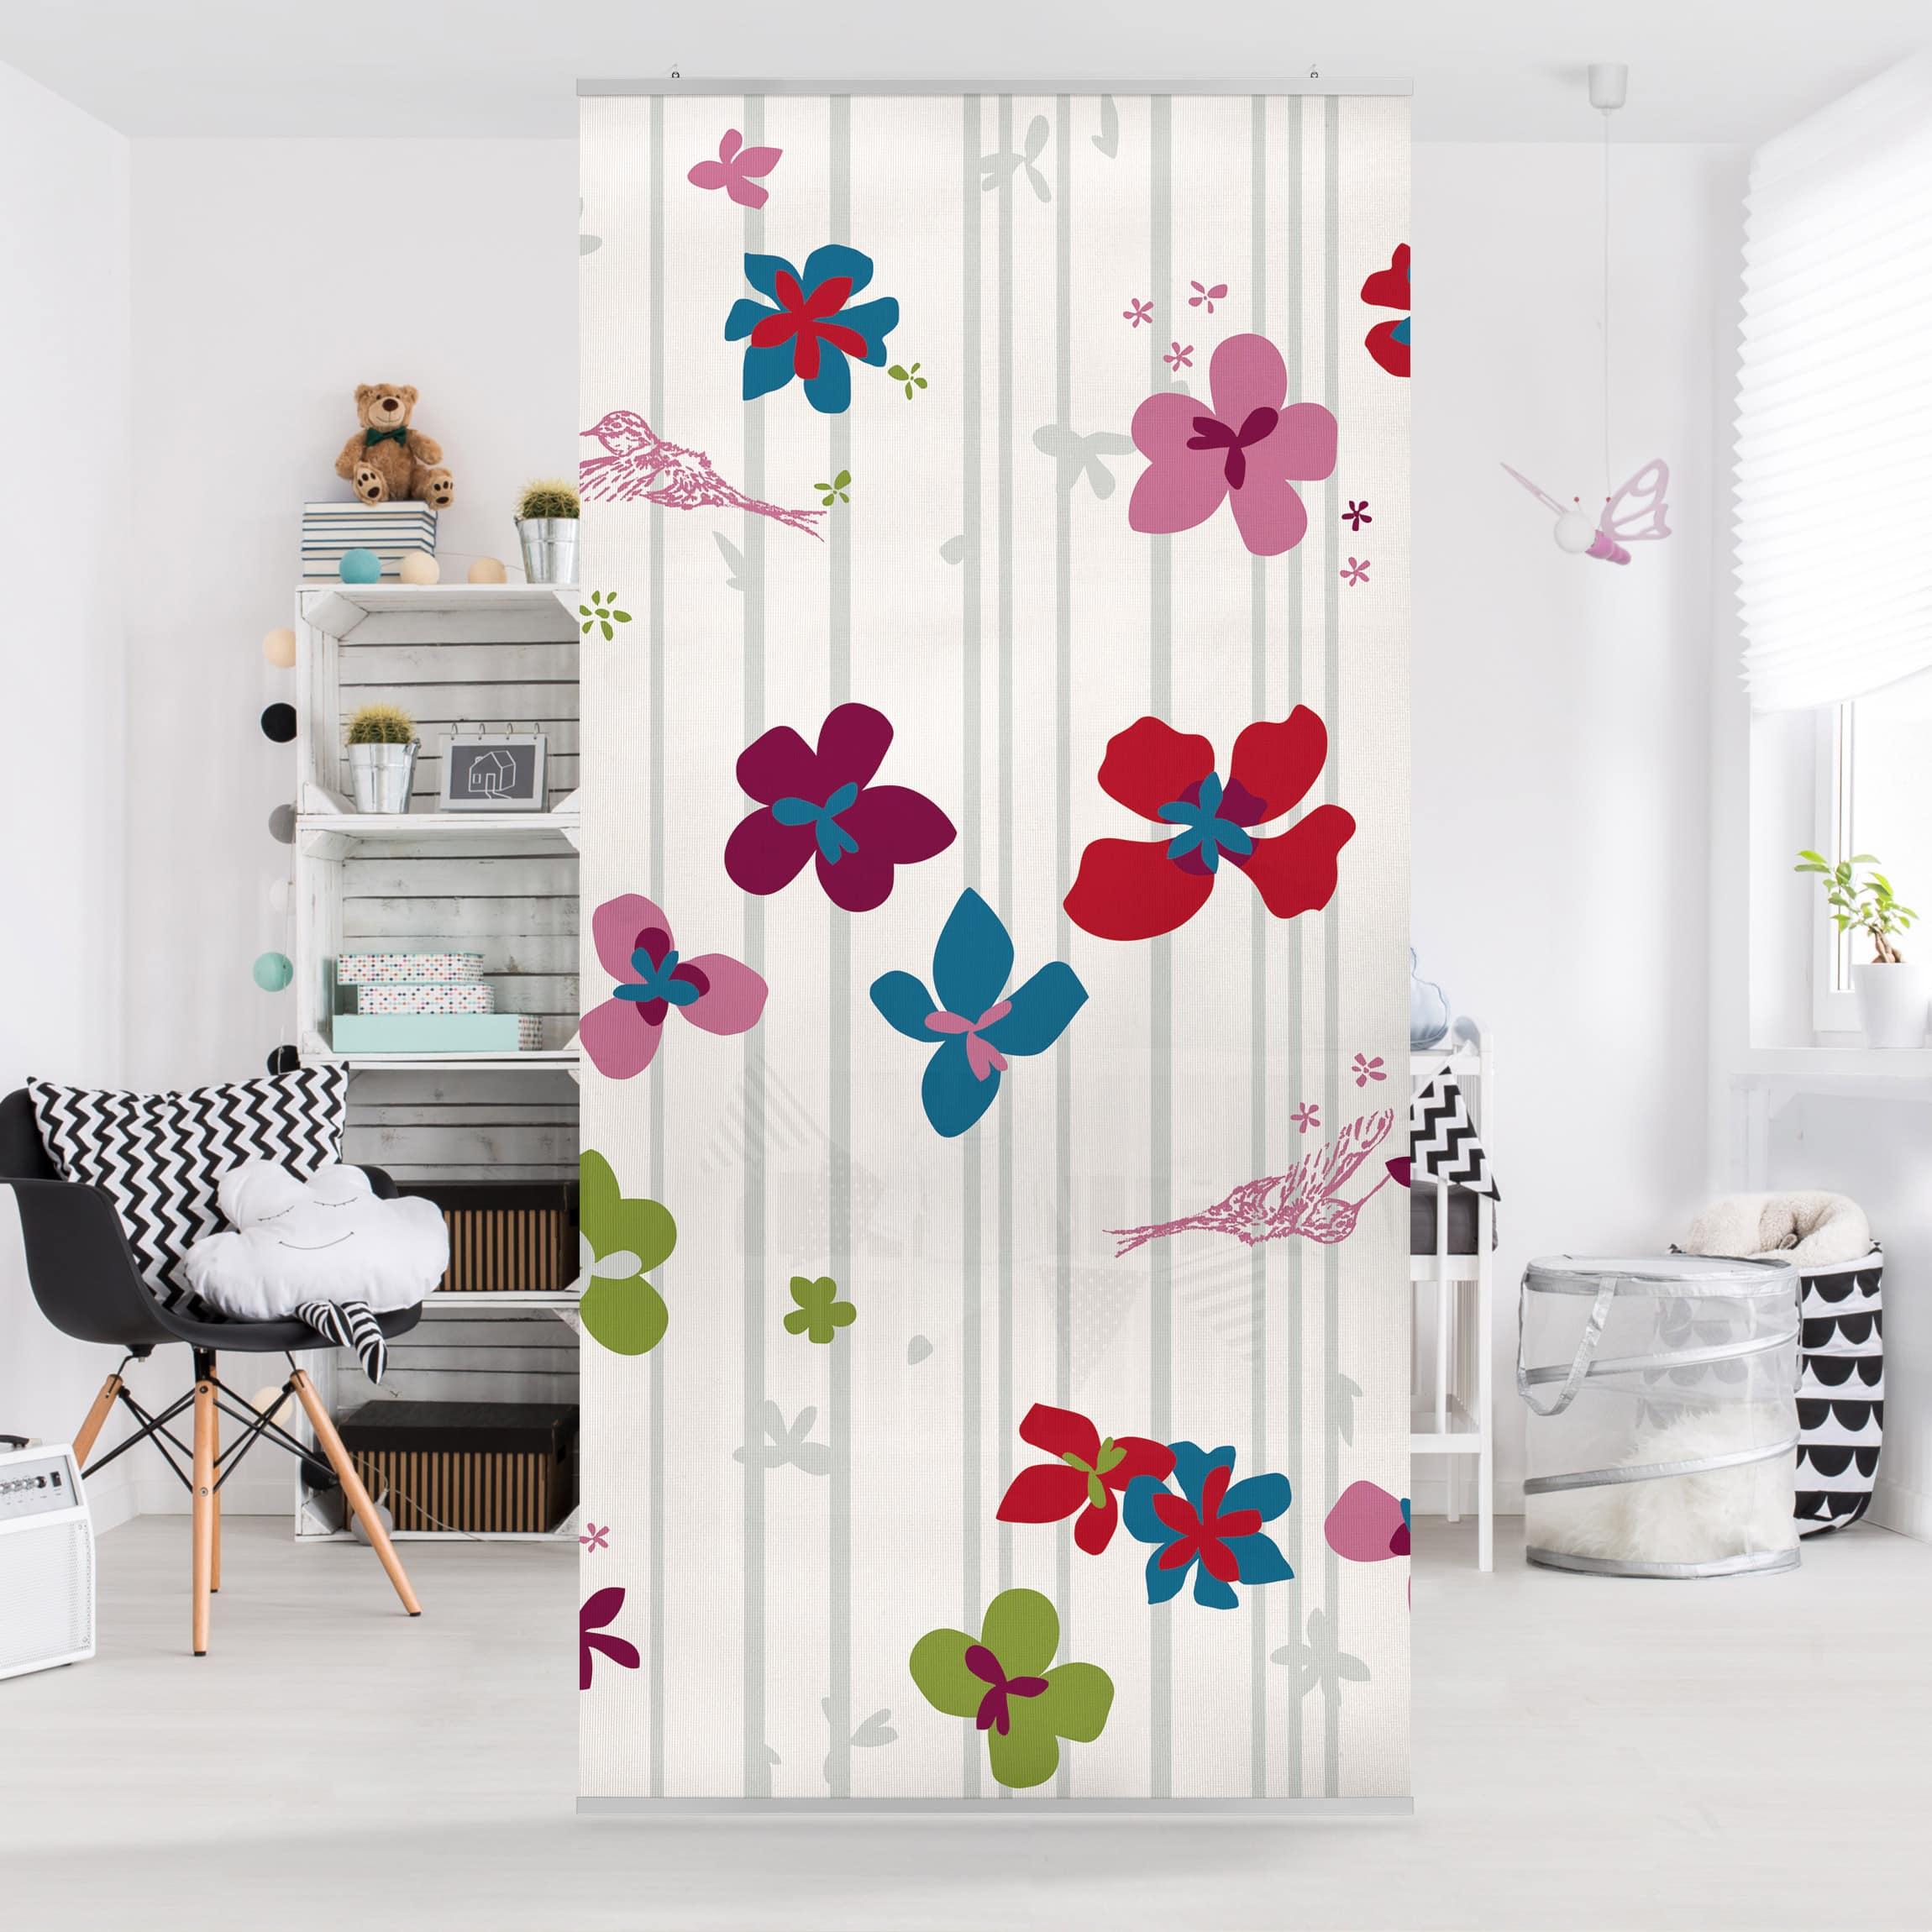 Full Size of Raumteiler Kinderzimmer Floral Pattern 250x120cm Regal Sofa Regale Weiß Kinderzimmer Raumteiler Kinderzimmer